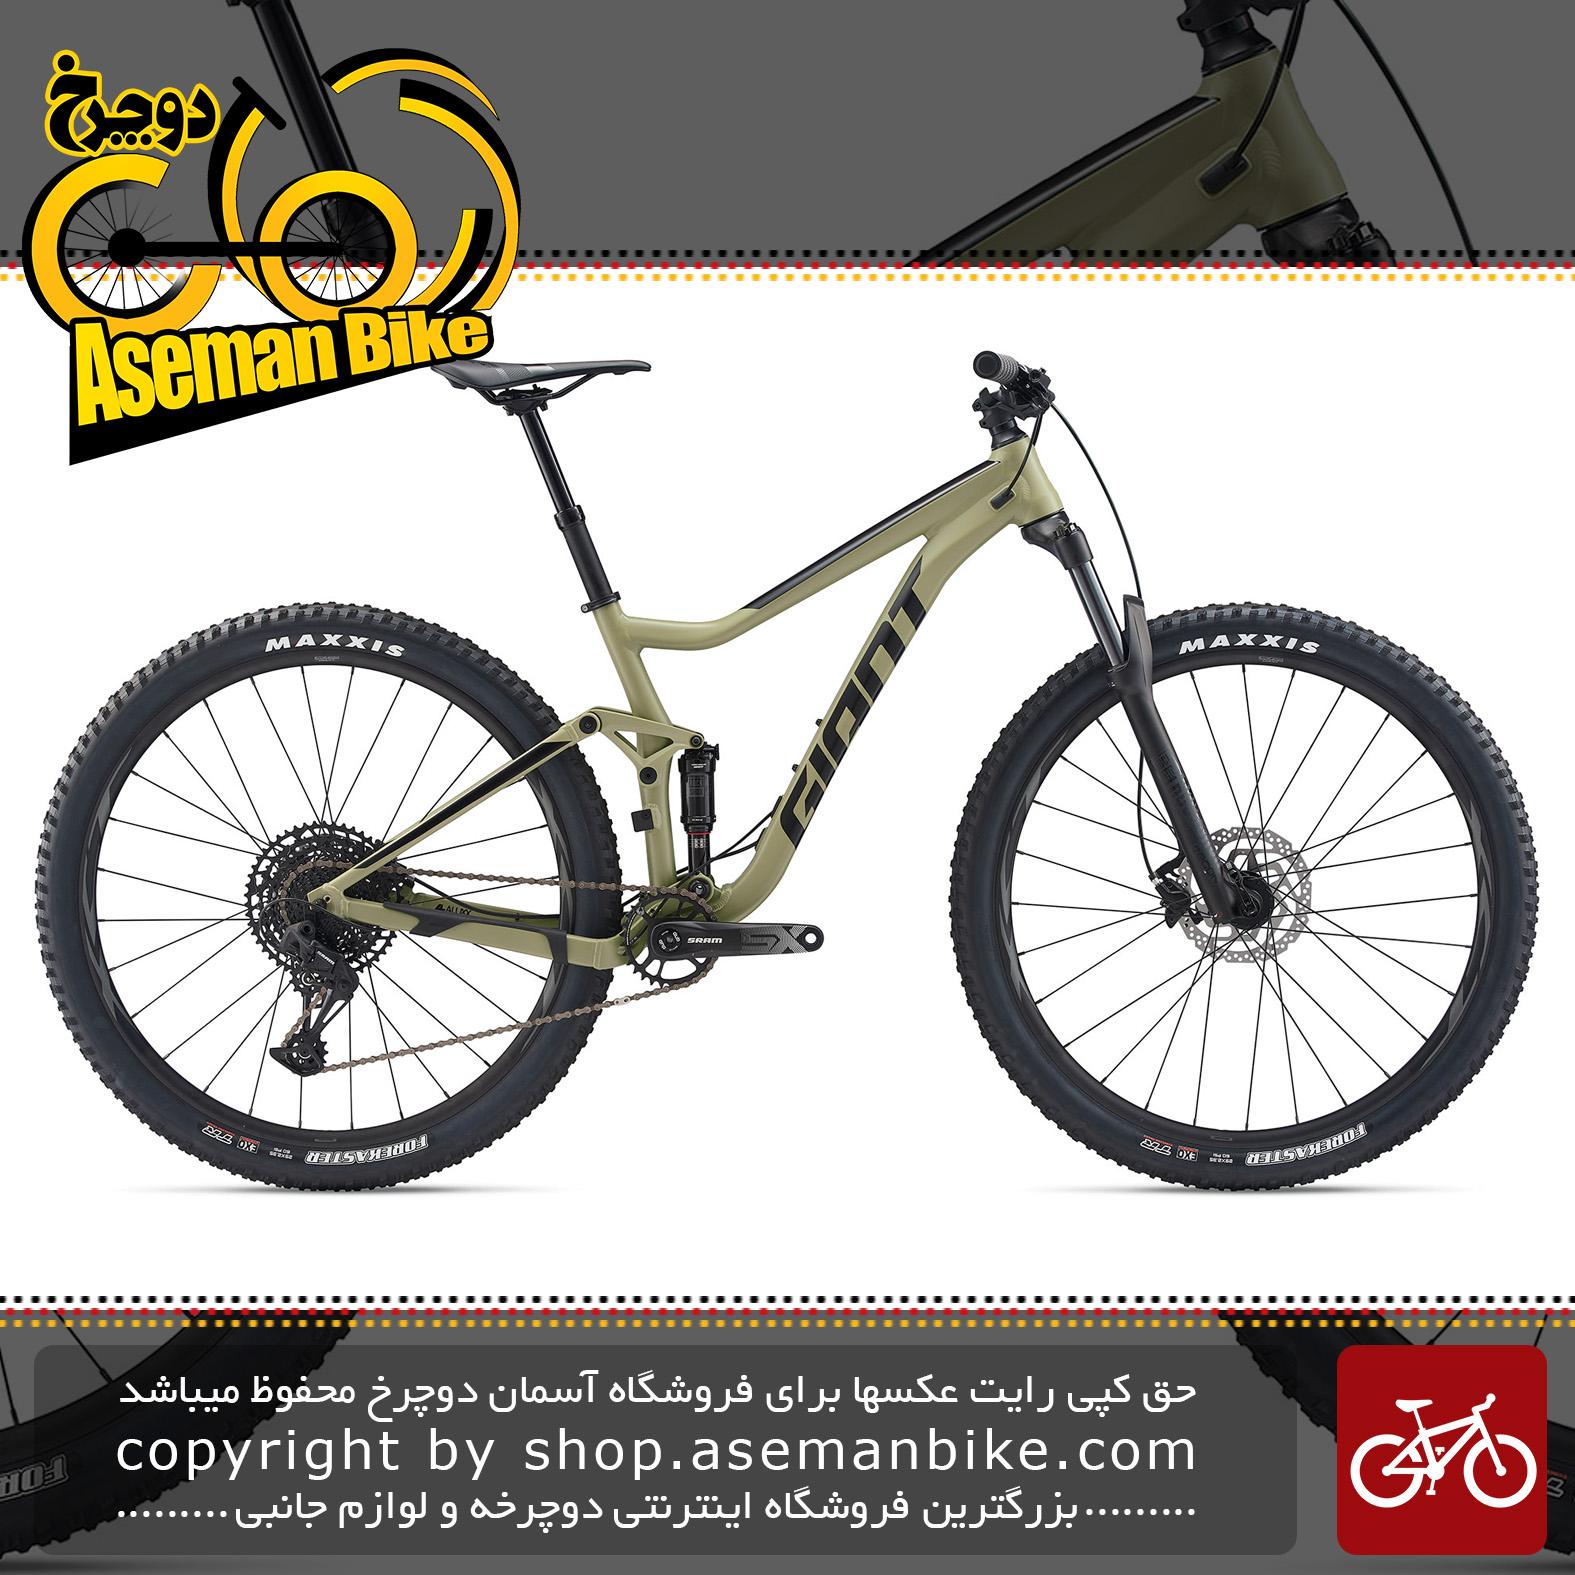 دوچرخه کوهستان جاینت مدل استنس 29 اینچ 1 2020 Giant Mountain Bicycle Stance 29 1 2020